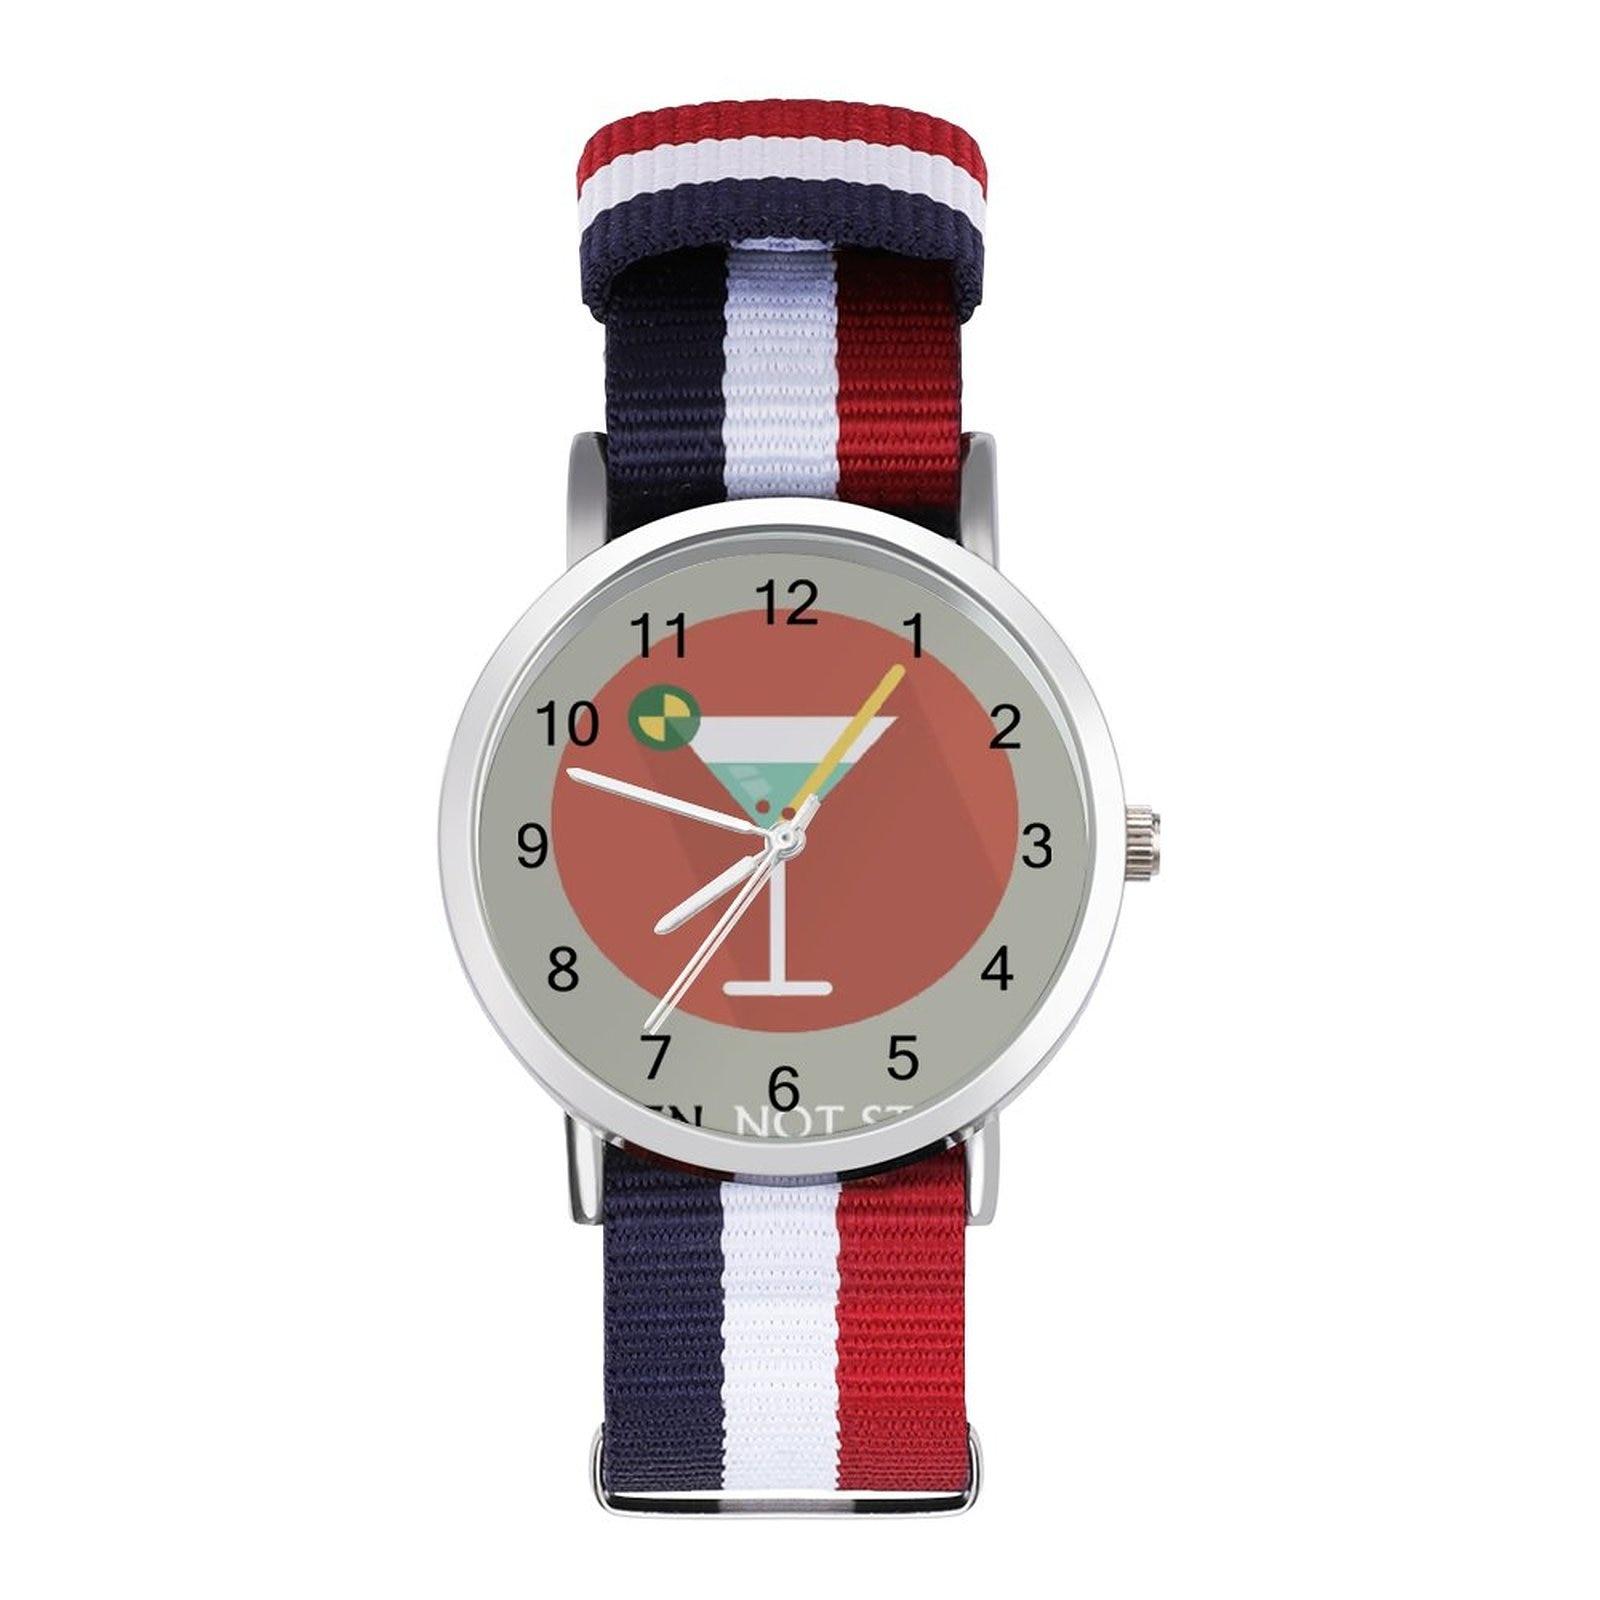 James Bond Quartz Watch Boys Fishing Wrist Watch Analog Design Unusual Wristwatch